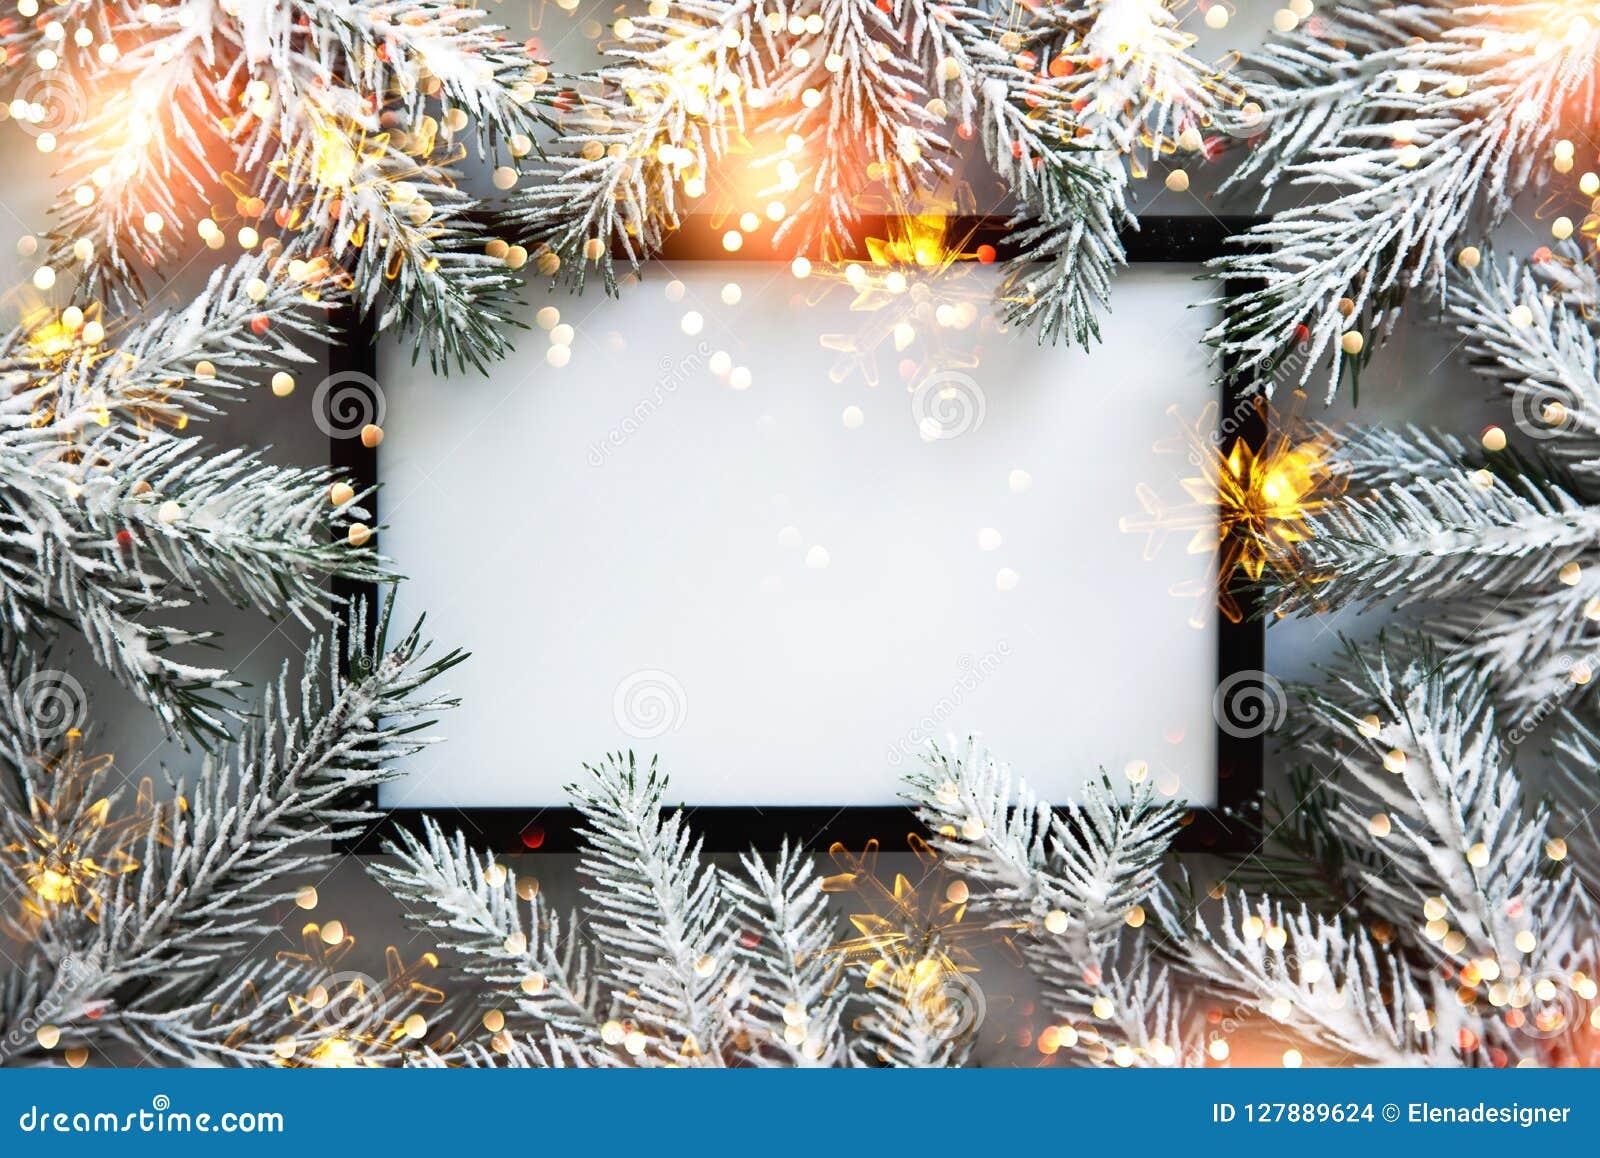 christmas frame background with xmas tree merry christmas